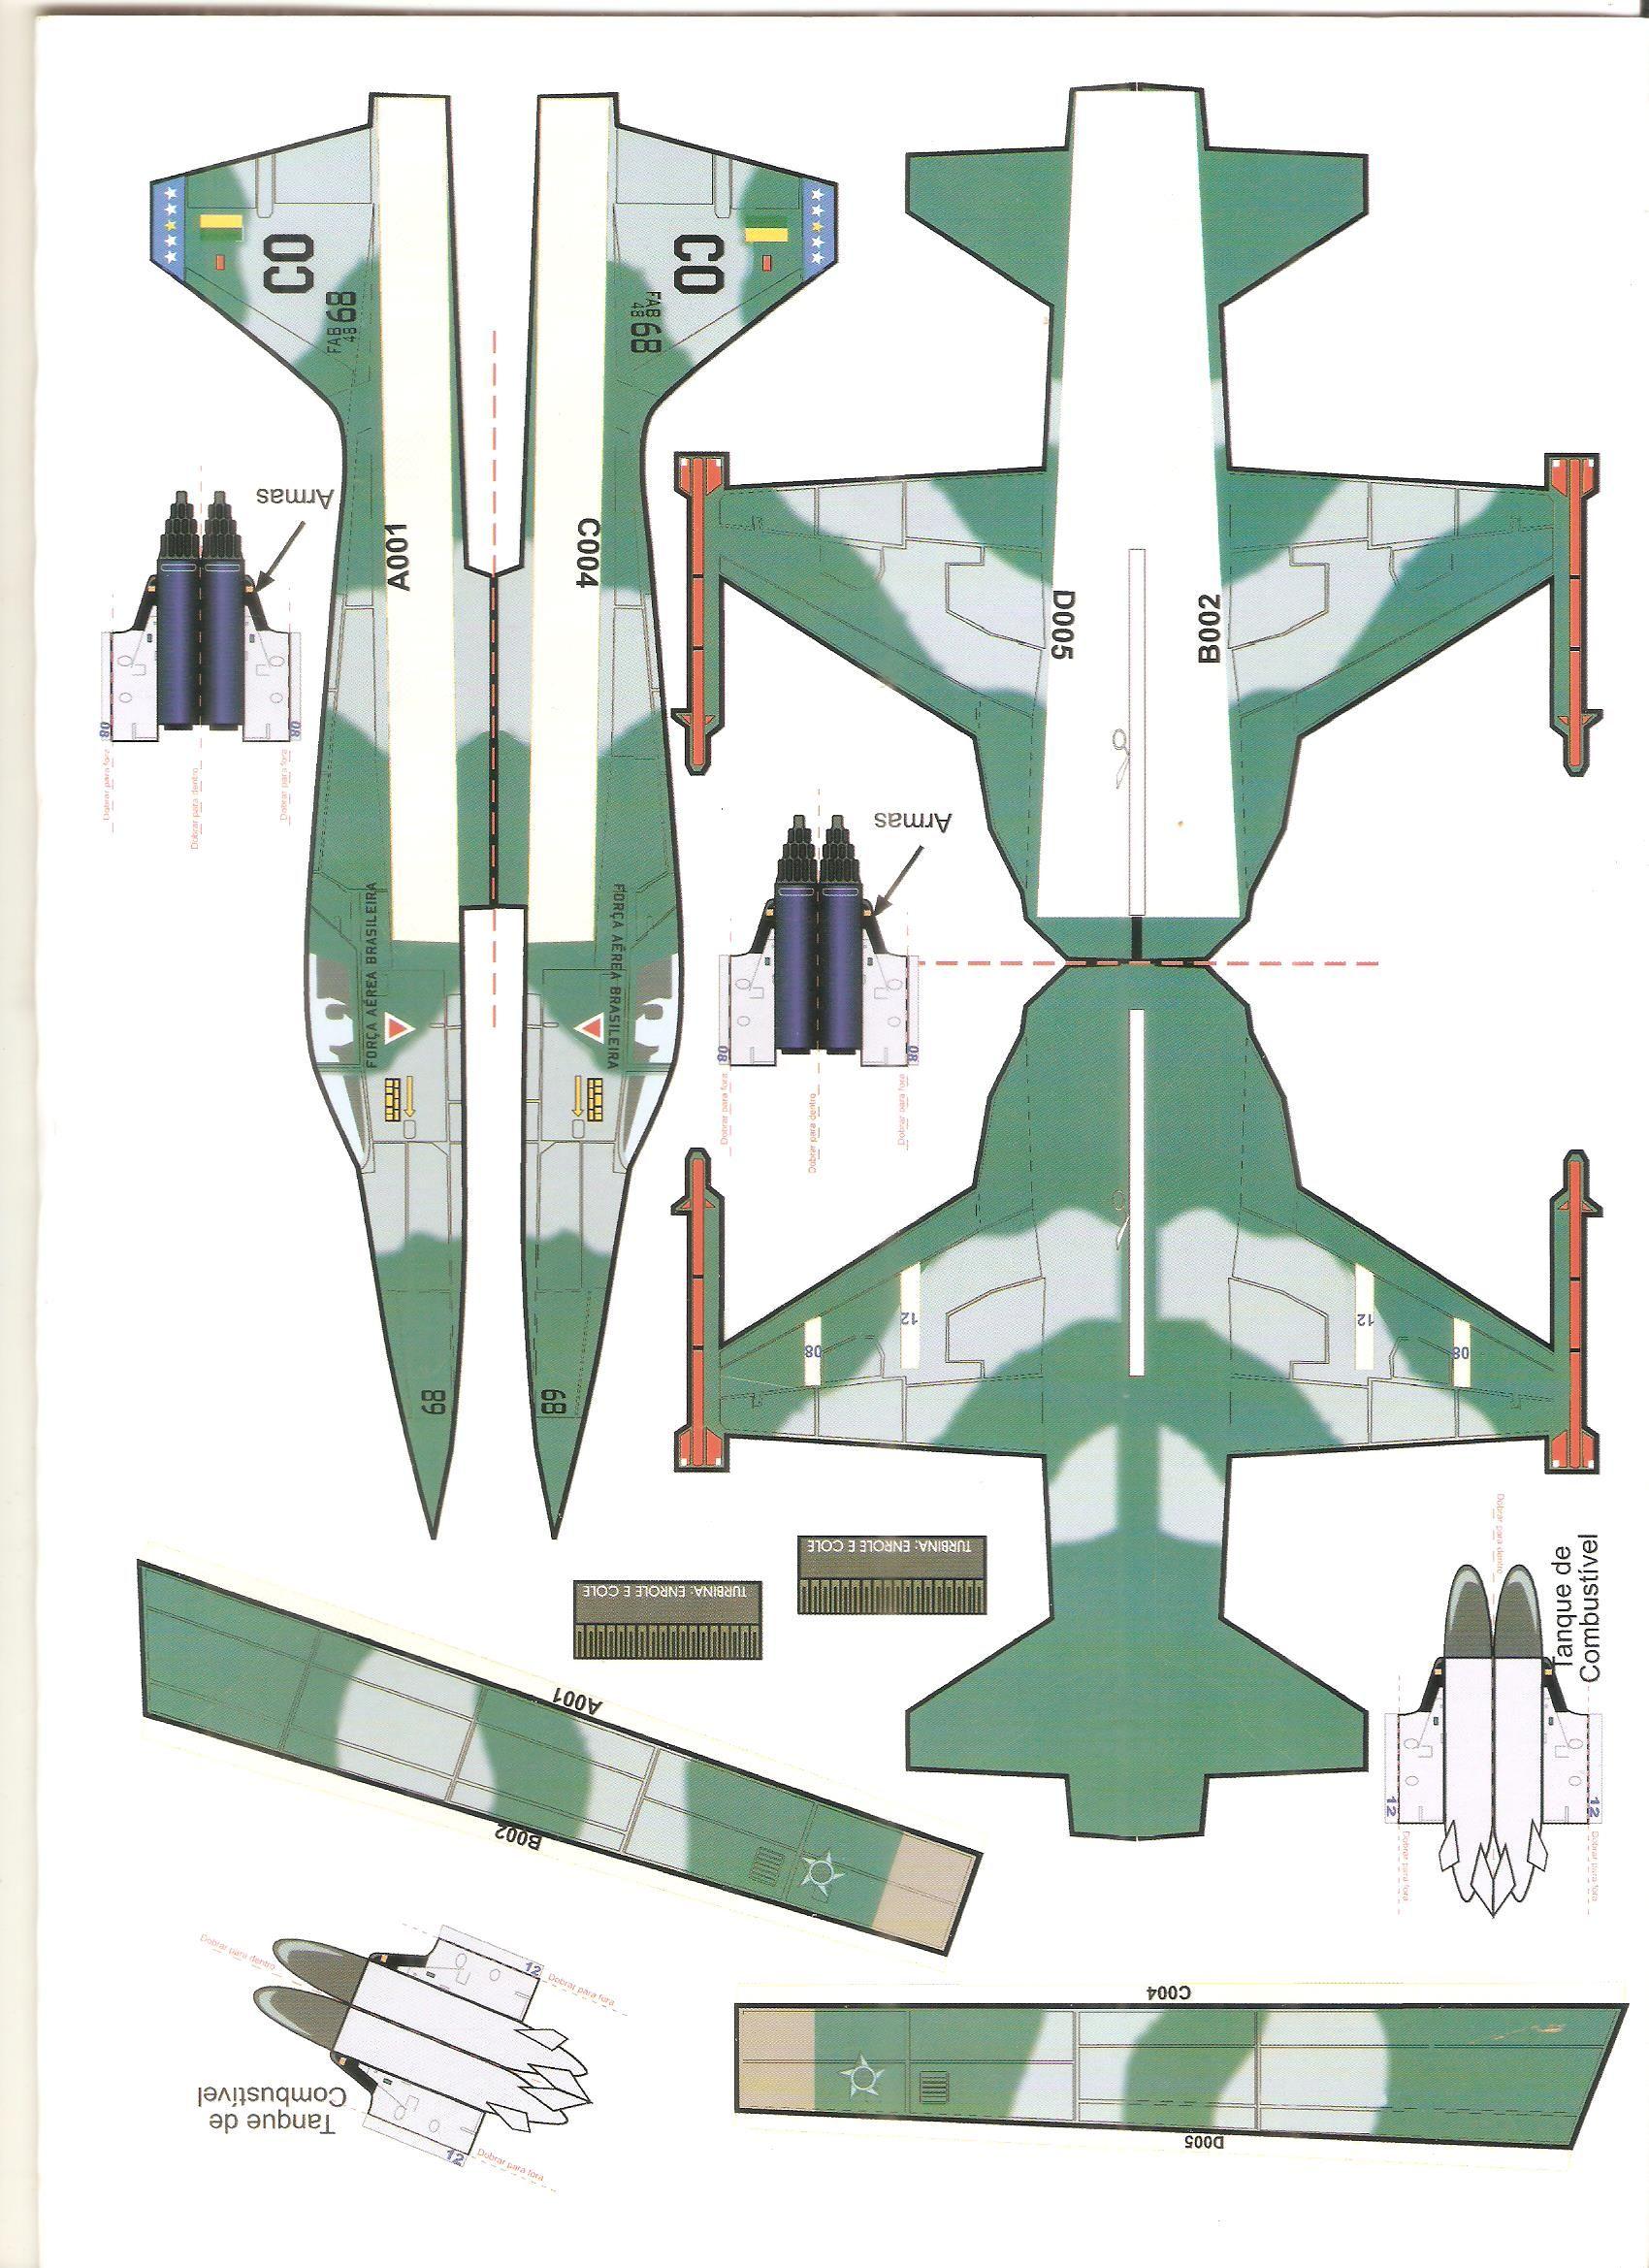 how to make aeroplane model with cardboard